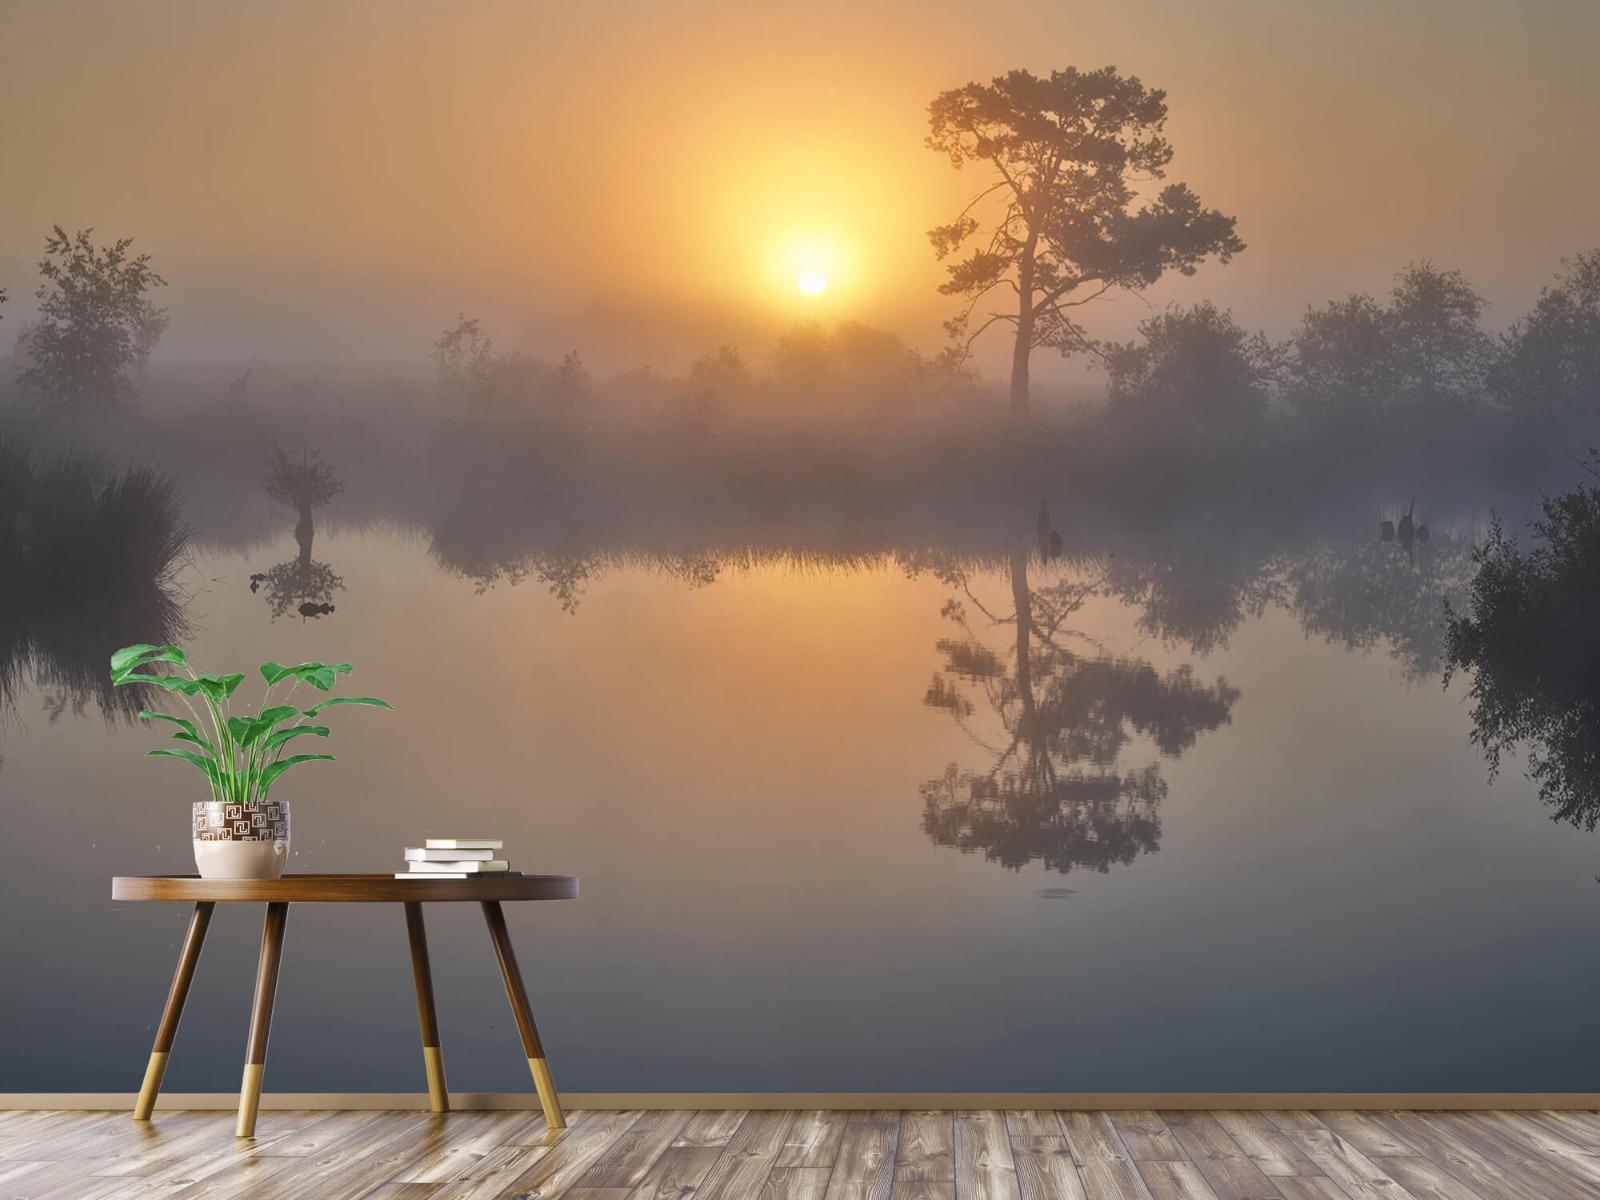 Natuur - Mistige zonsopkomst 5